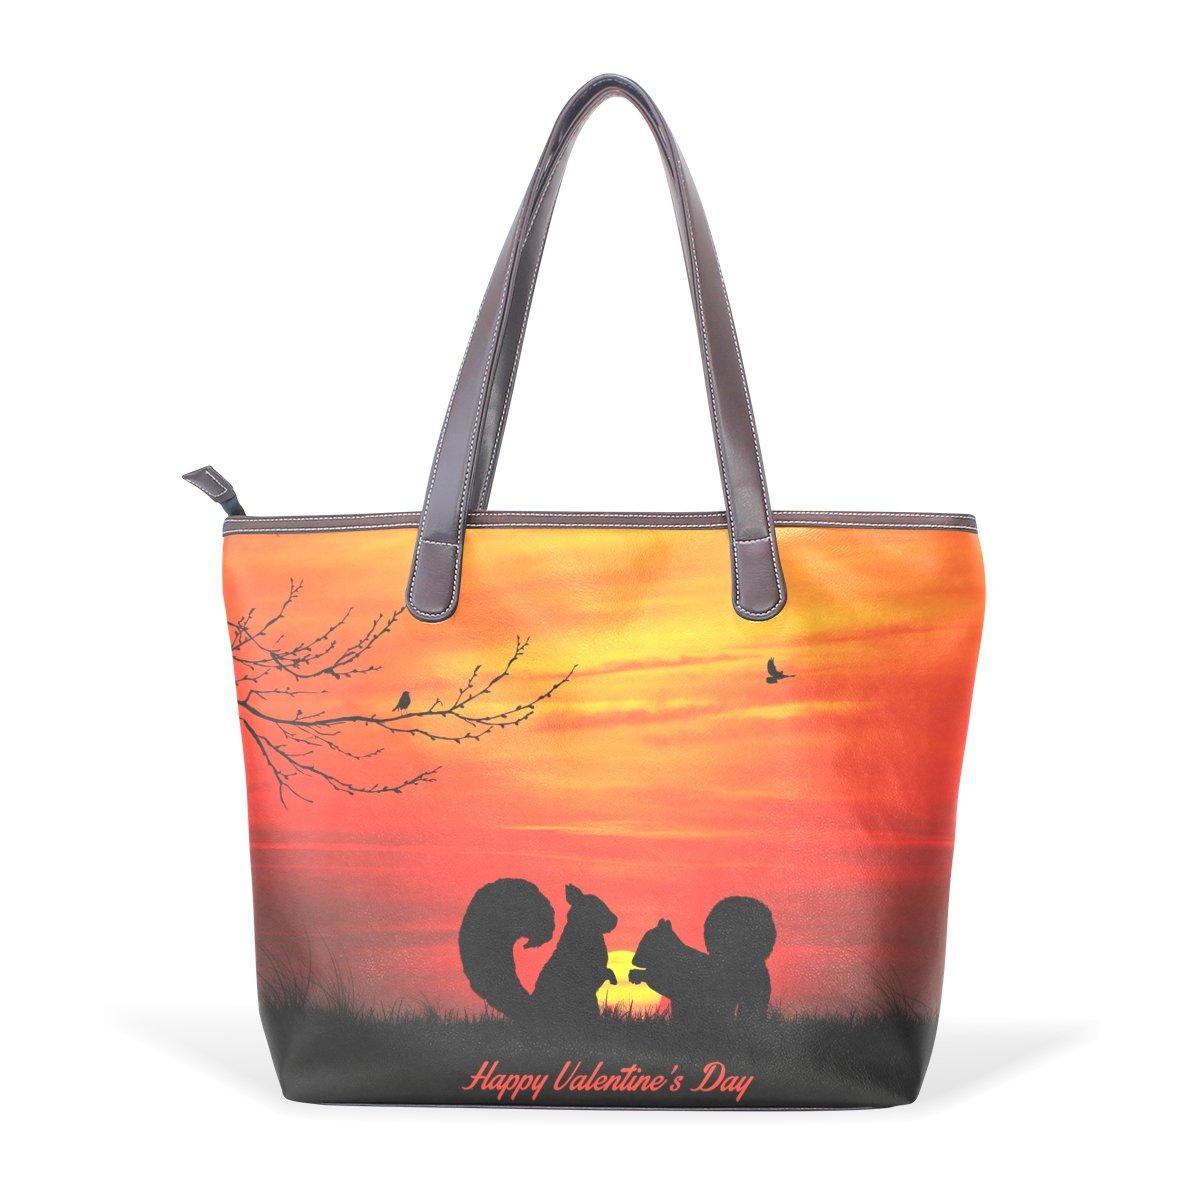 TIZORAX , Damen Tote-Tasche mehrfarbig B07FTBRSY7 Shopper Bestellung willkommen